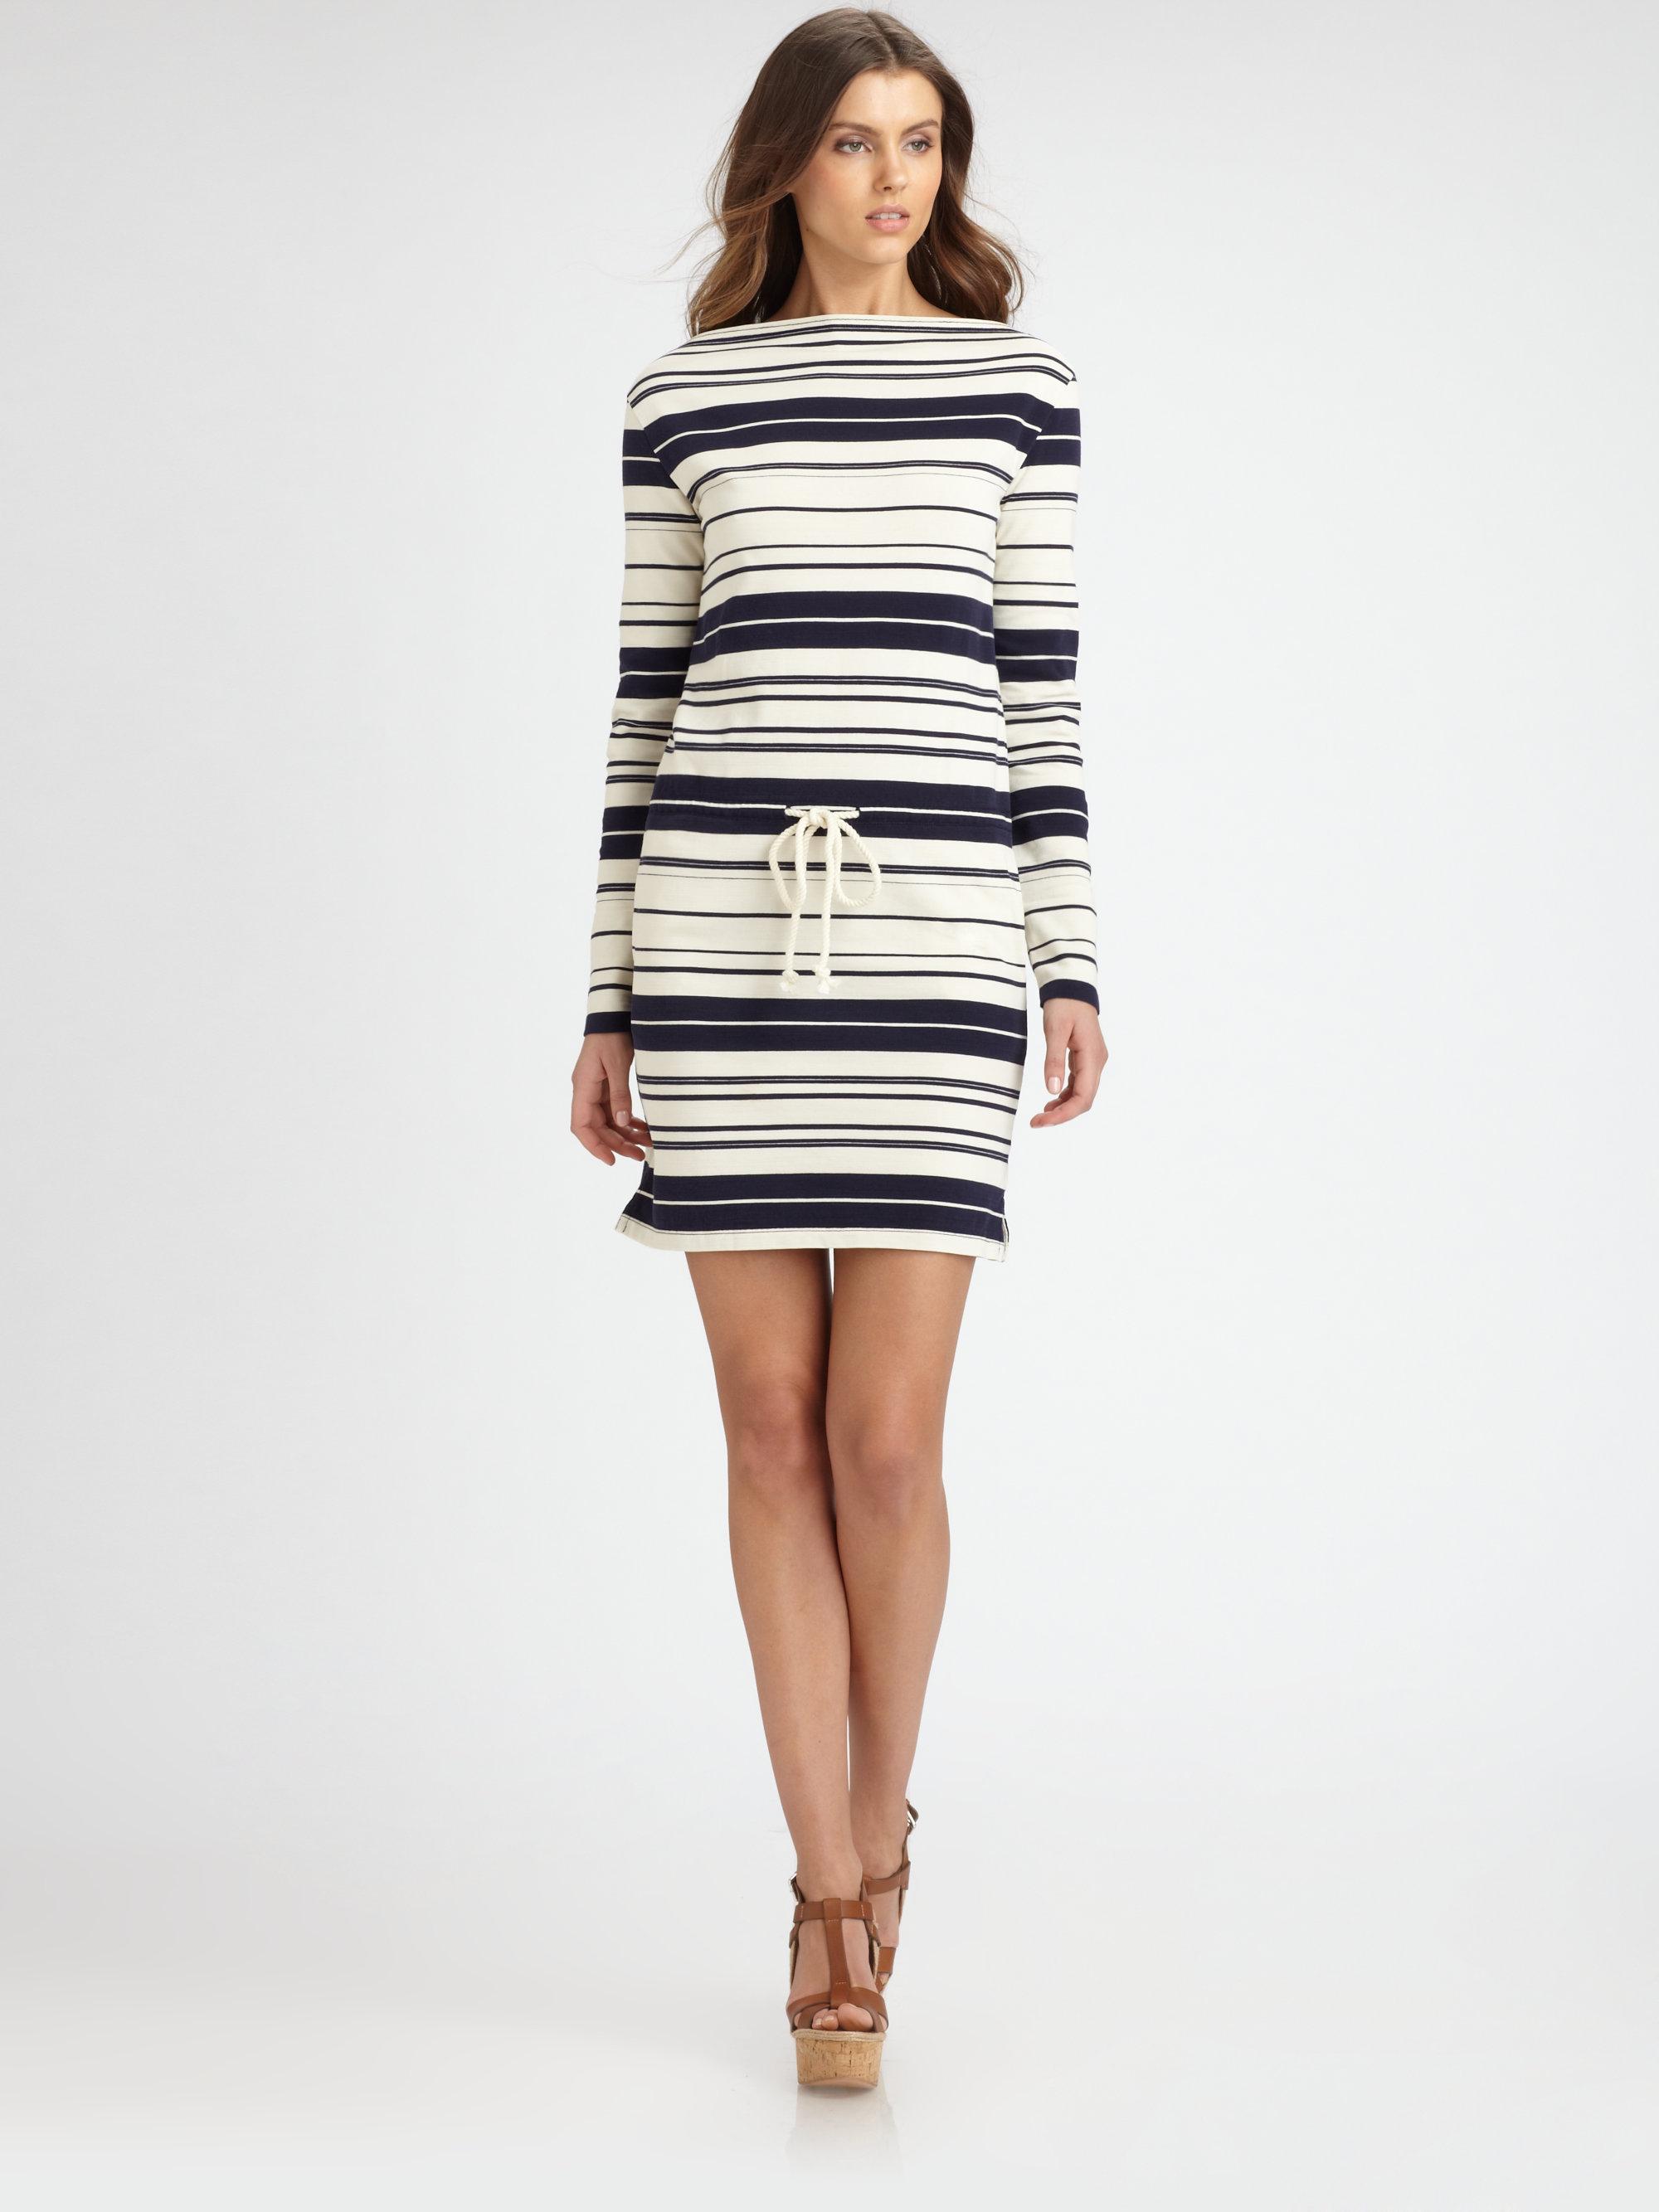 Lyst Ralph Lauren Blue Label Cotton Marcella Dress In Blue